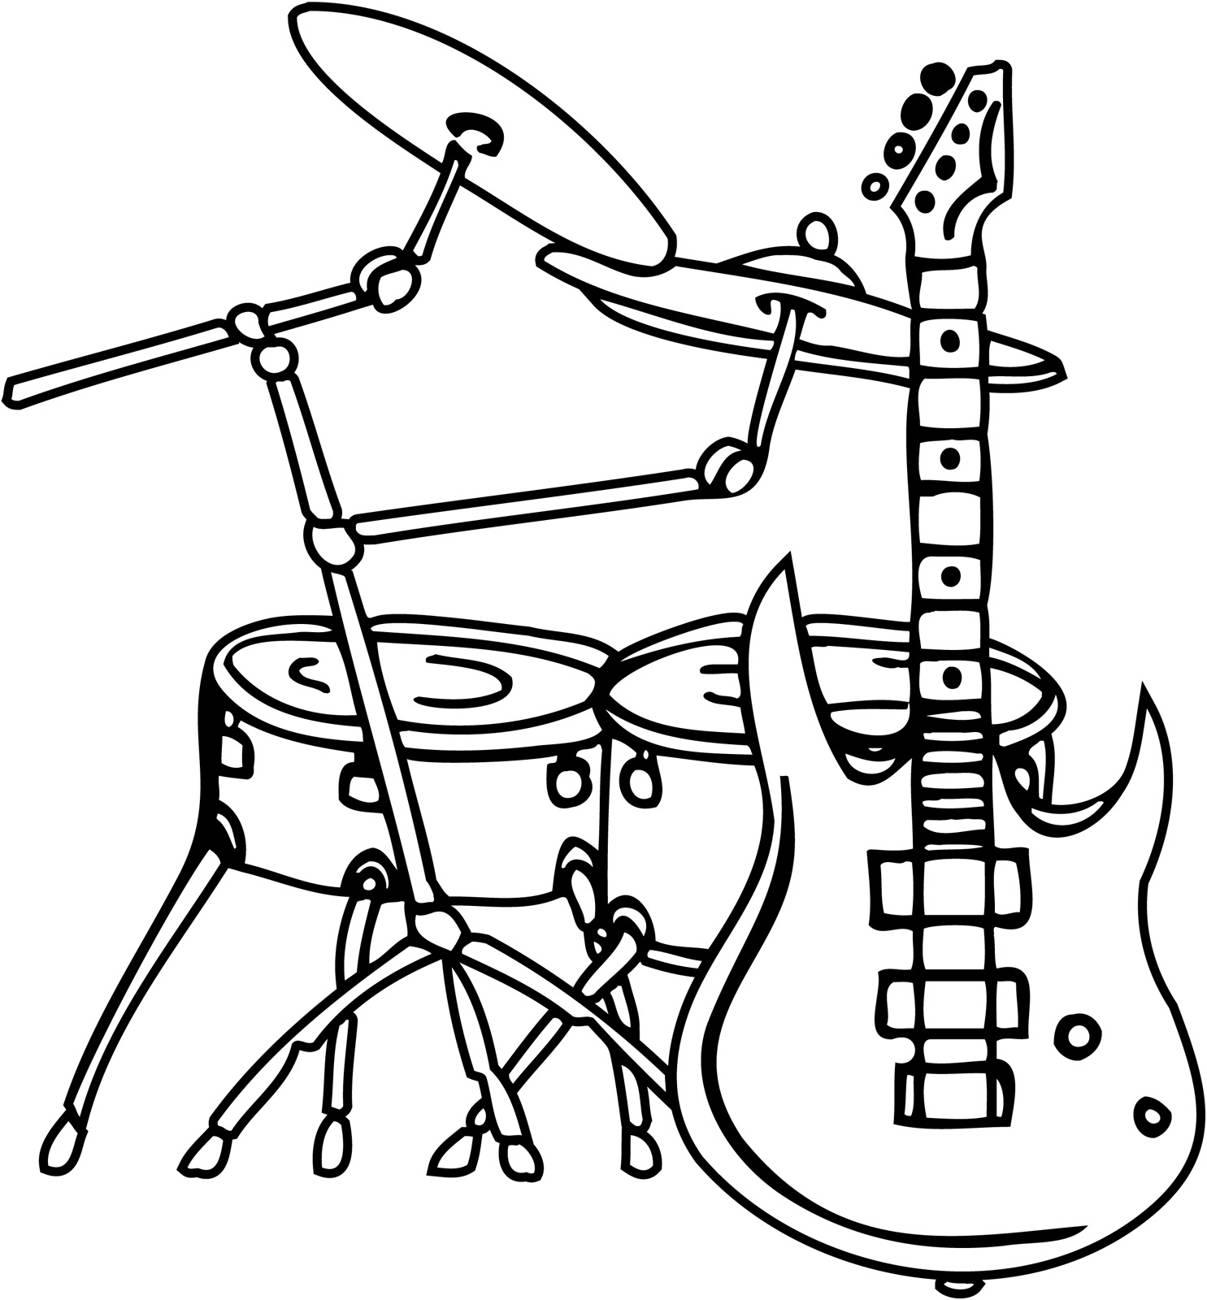 MUSIC-088